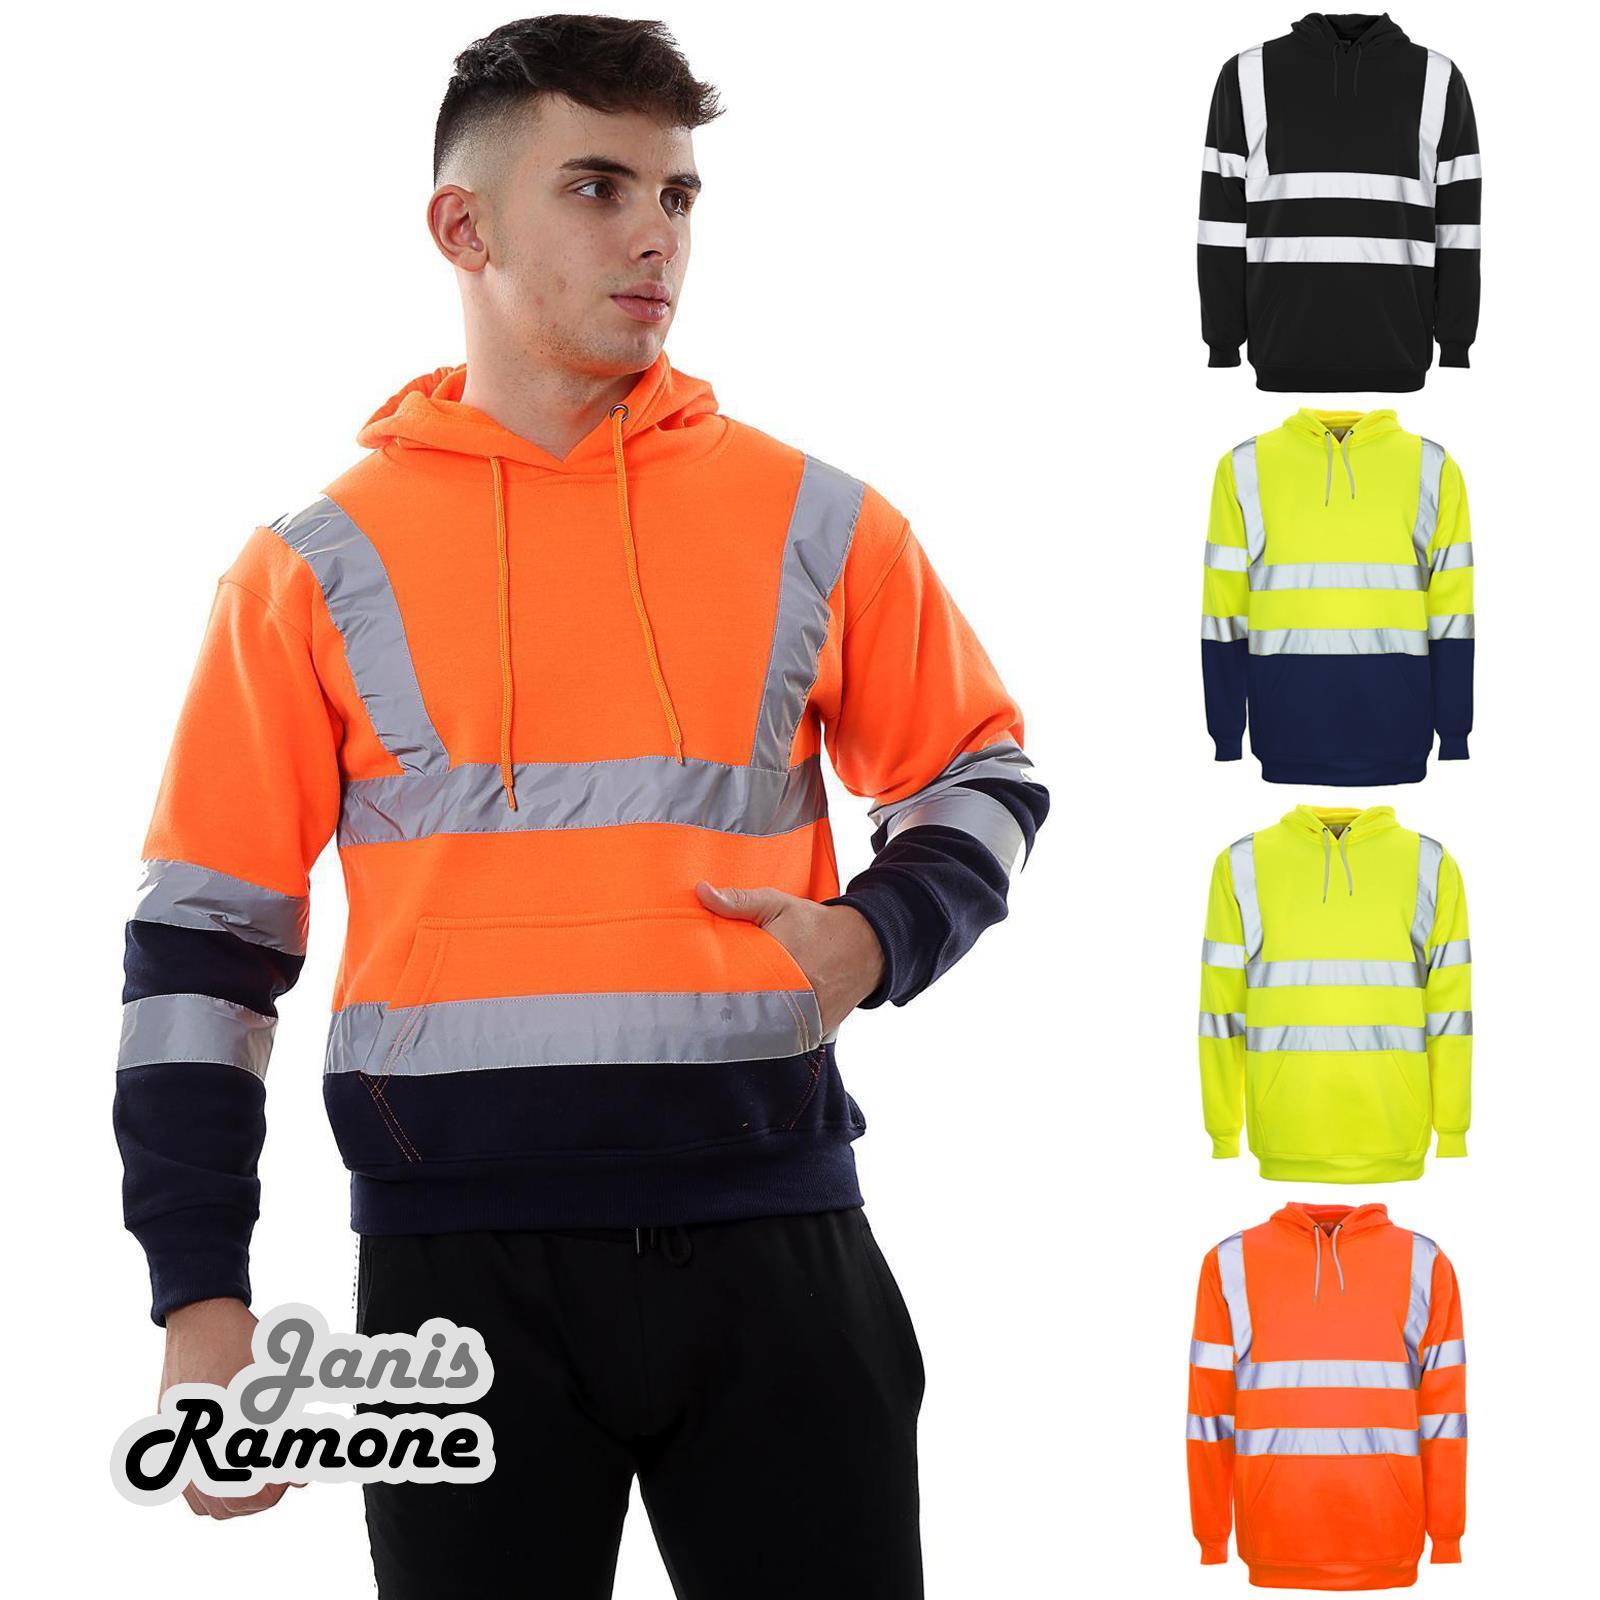 Men Hooded Jacket Sweatshirt Jumper PullOver Zipper Fleece Hoodie Work Safety